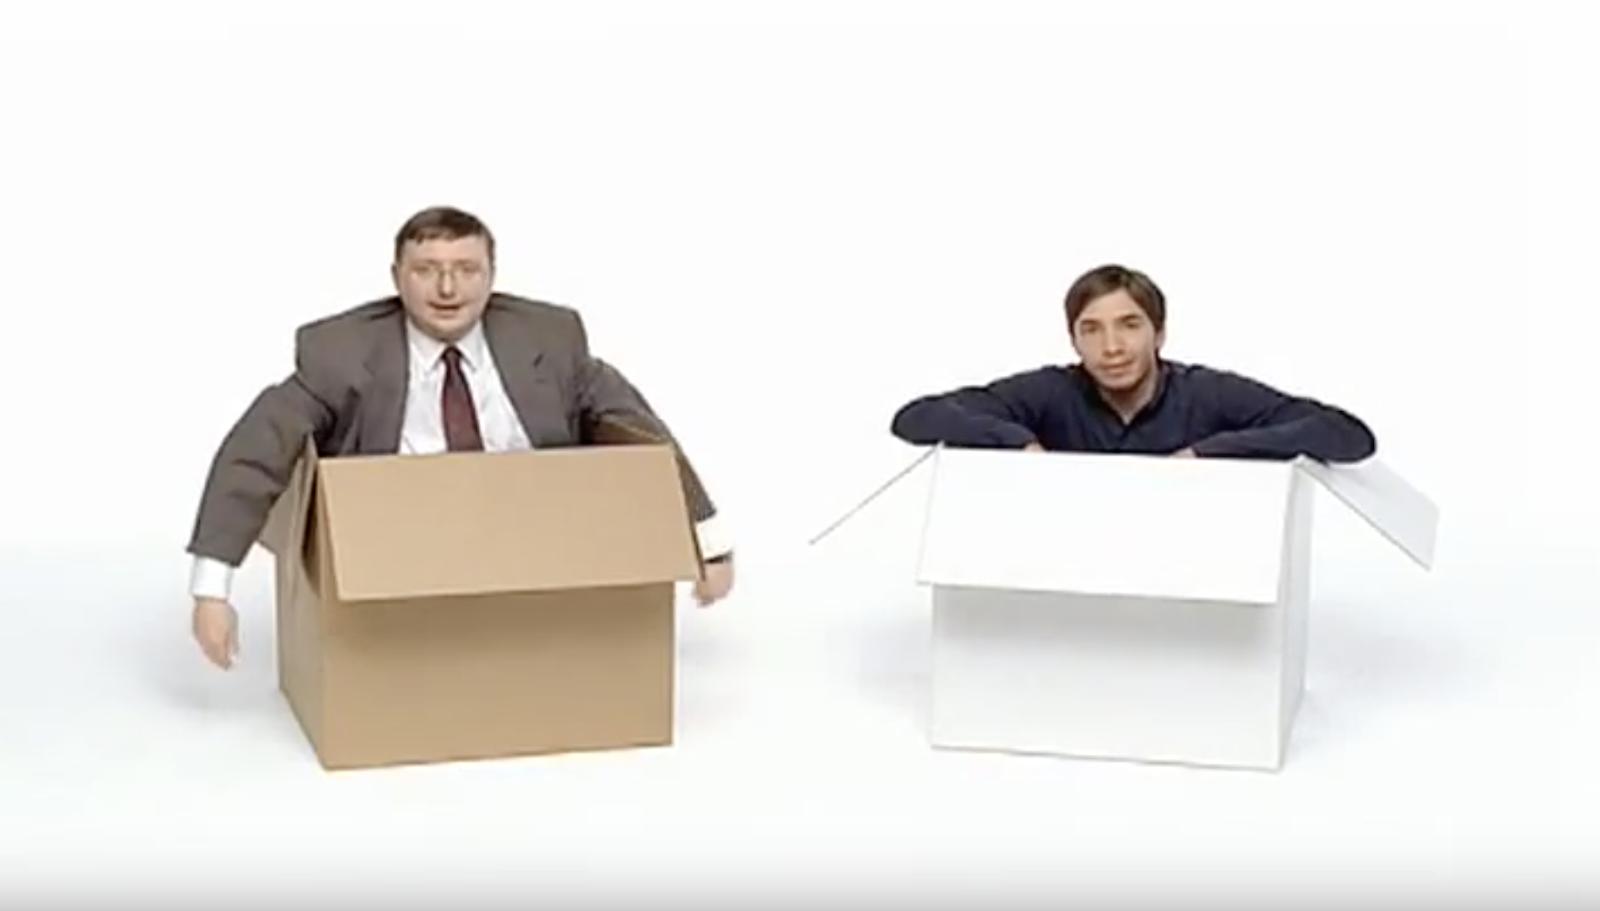 Apple vs Microsoft advertising video